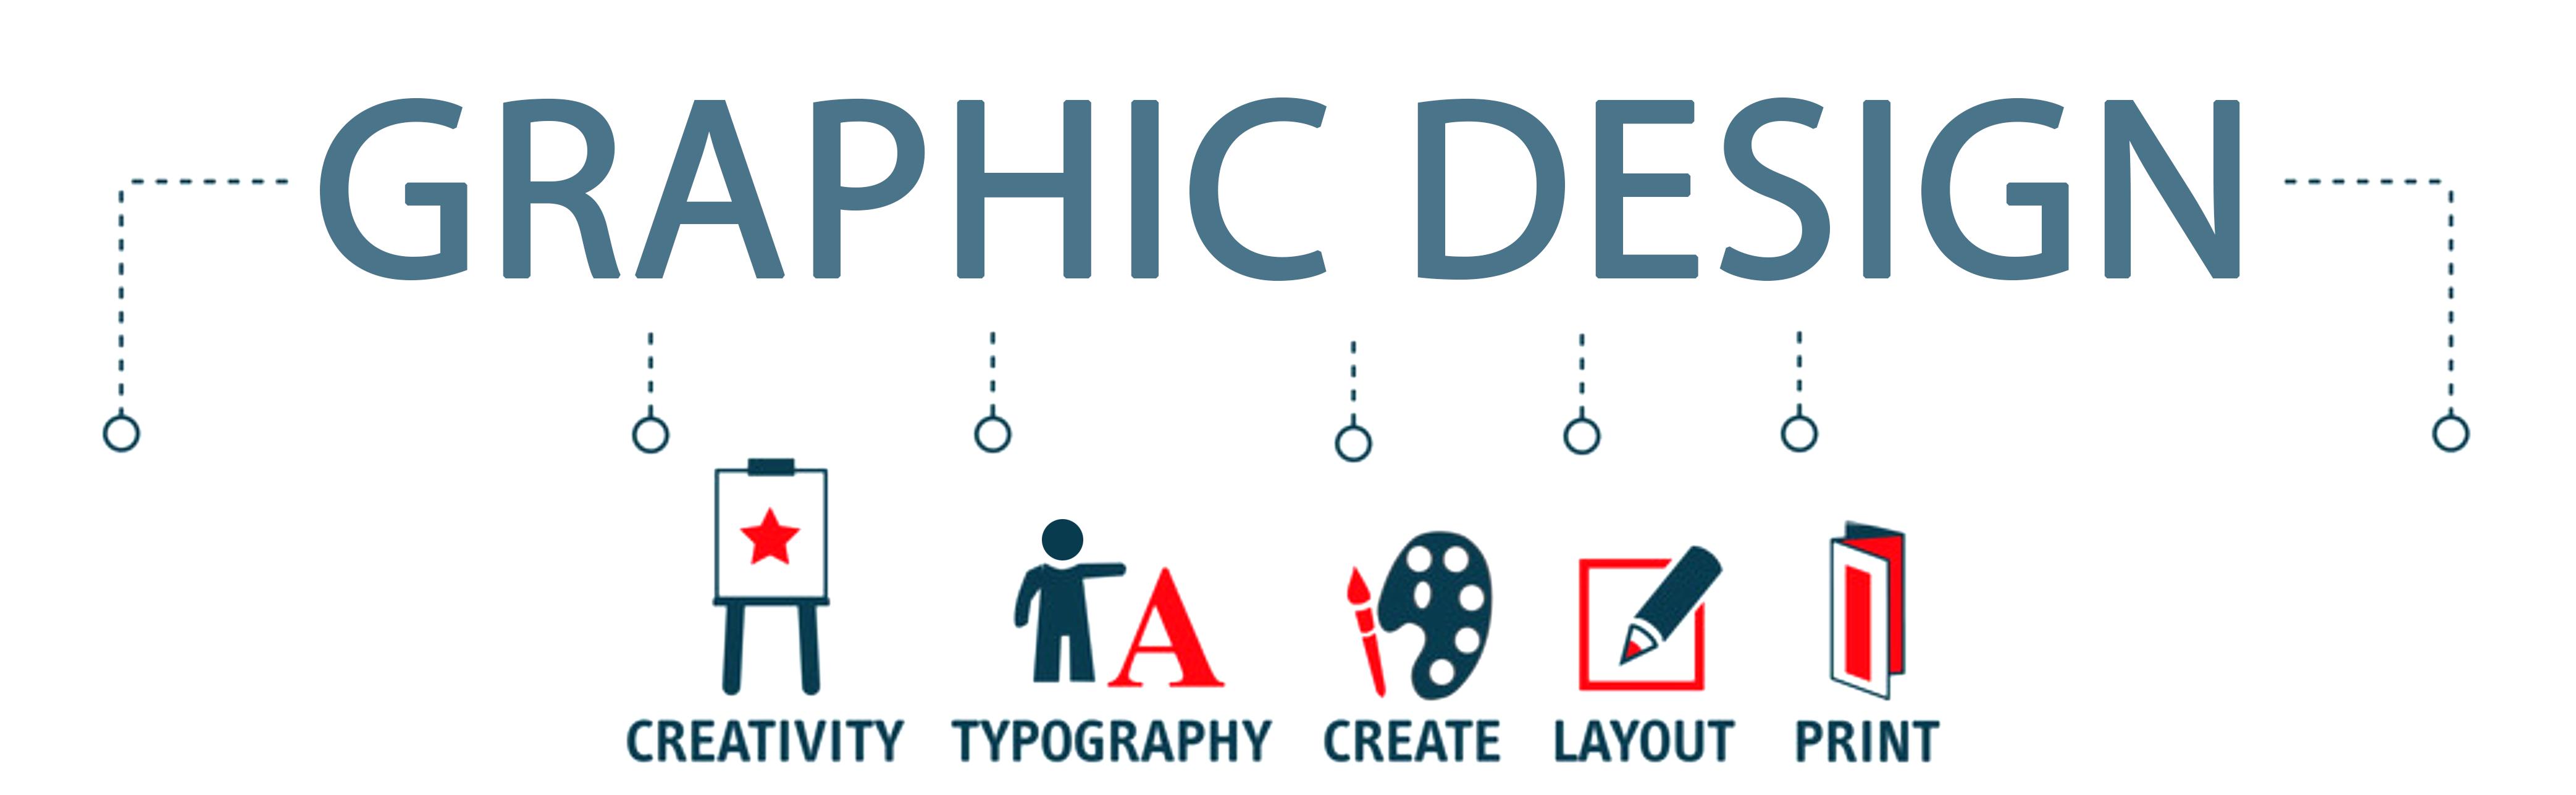 design services gnomon copy printer in Charlotte, NC Lebanon, NH Hanover, NH